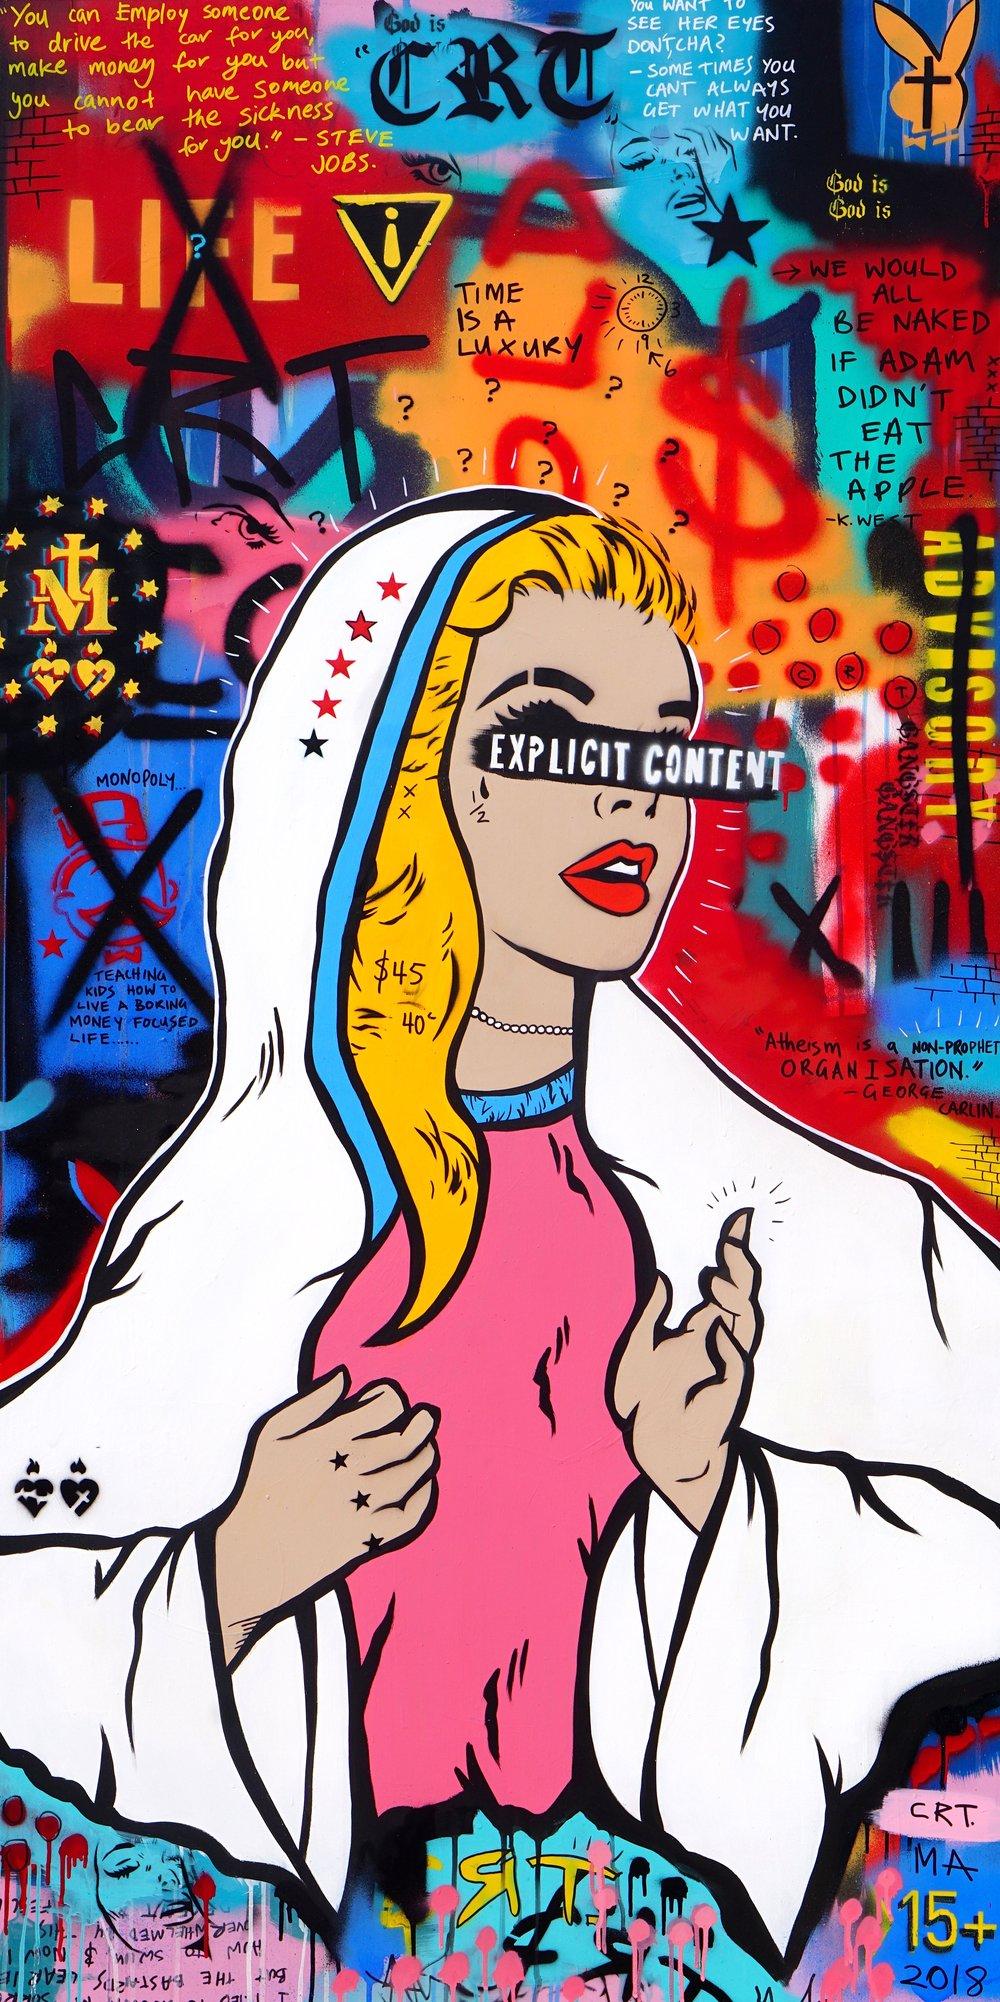 Explicit Content     'A Billionaire's Guide to Immortality'   92cm x 182cm Acrylic on Board 2018